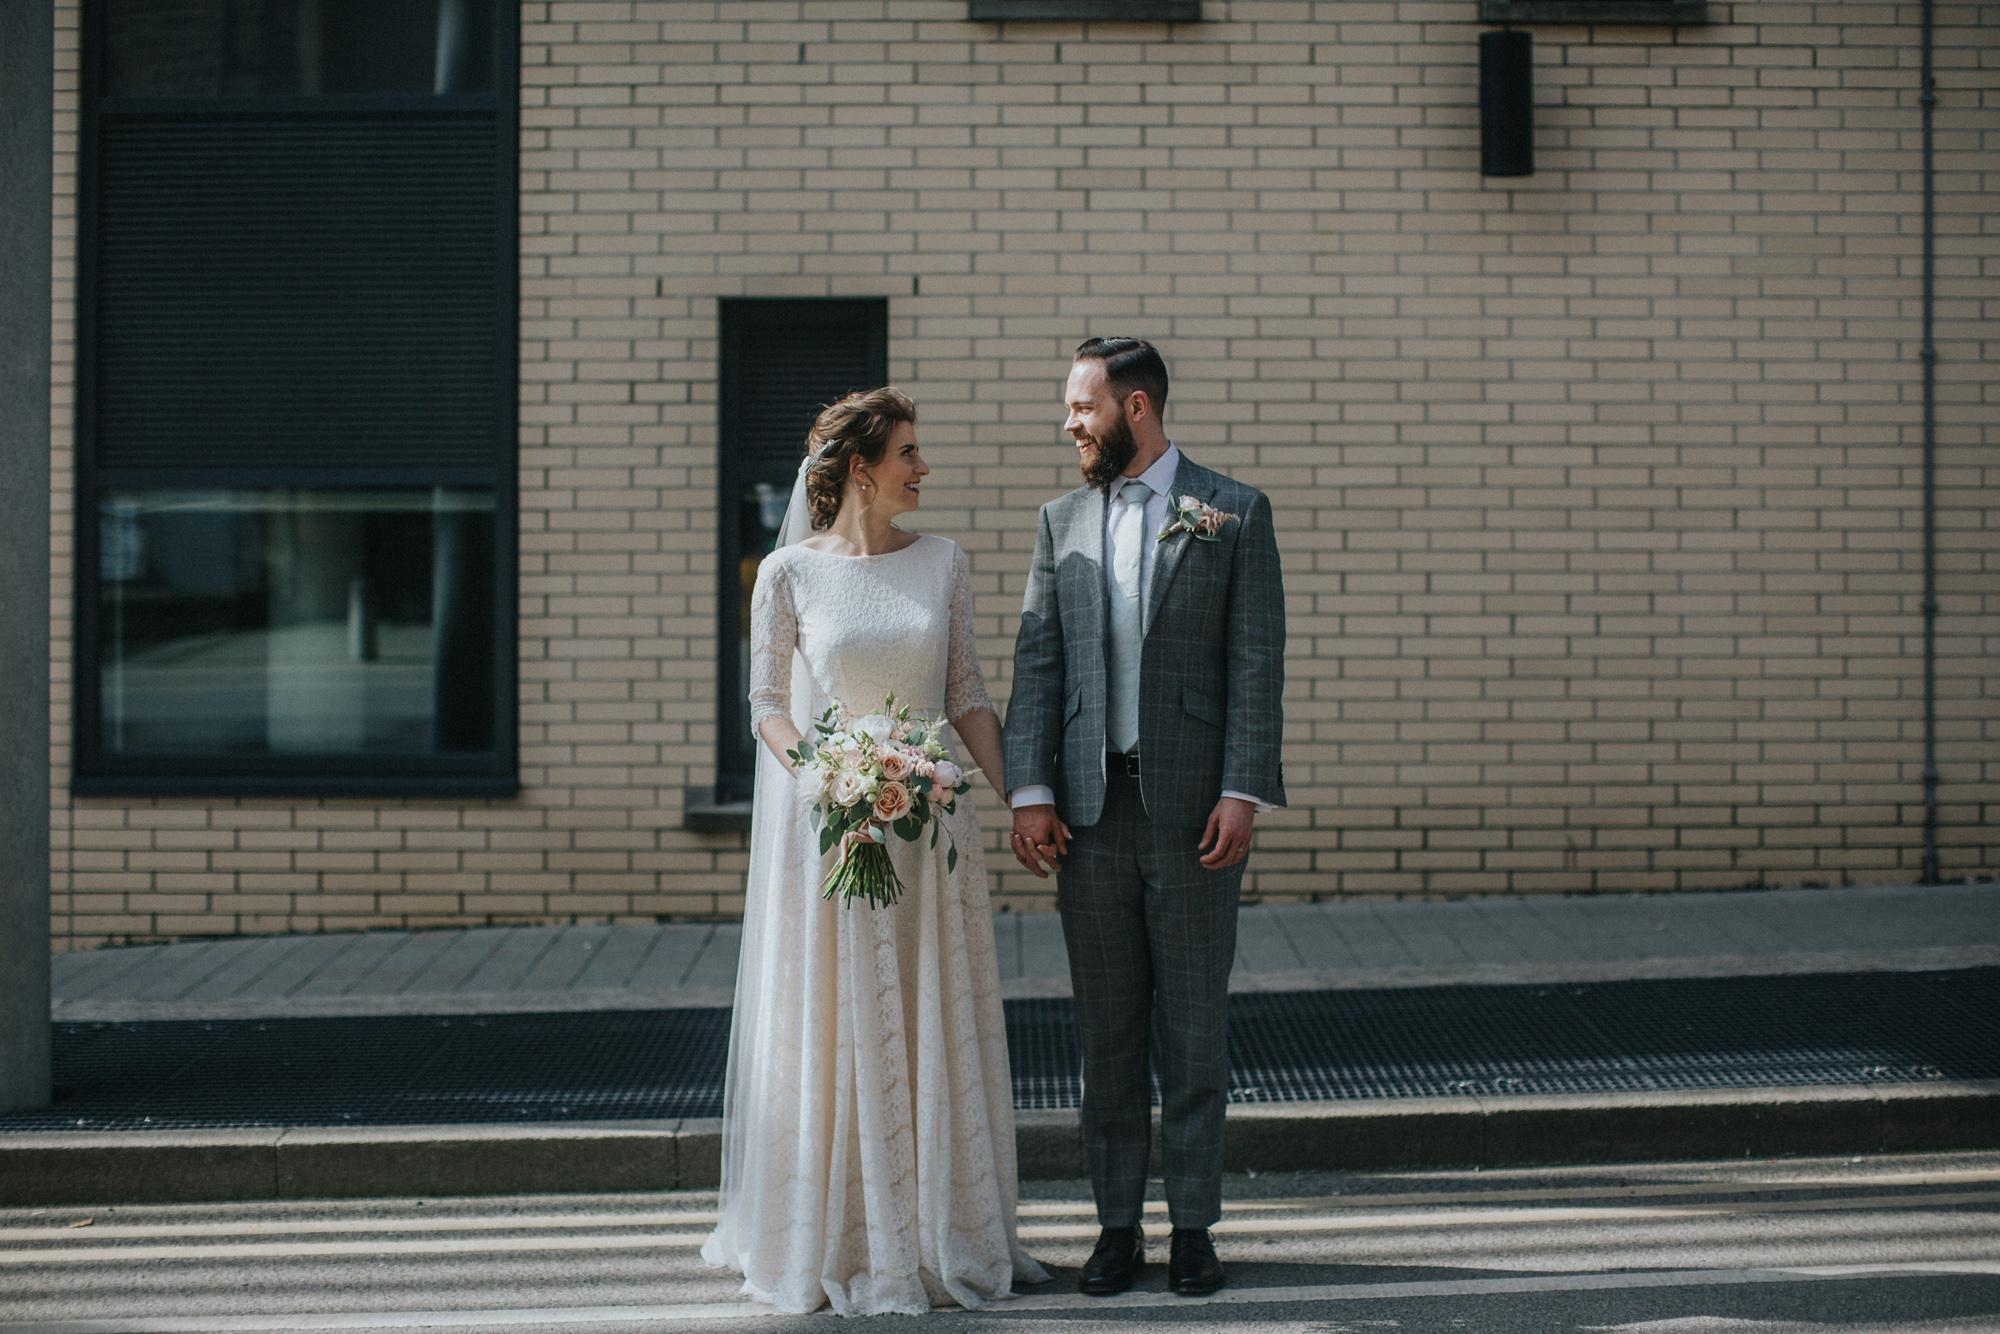 Kate-Beaumont-Lace-Flared-Dahlia-Gown-Leeds-Wedding-Bloom-Weddings-39.jpg